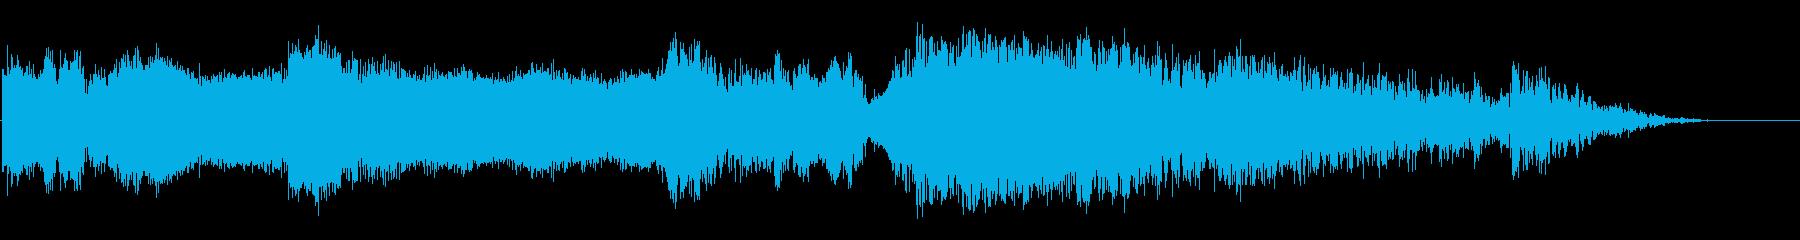 SETIの再生済みの波形